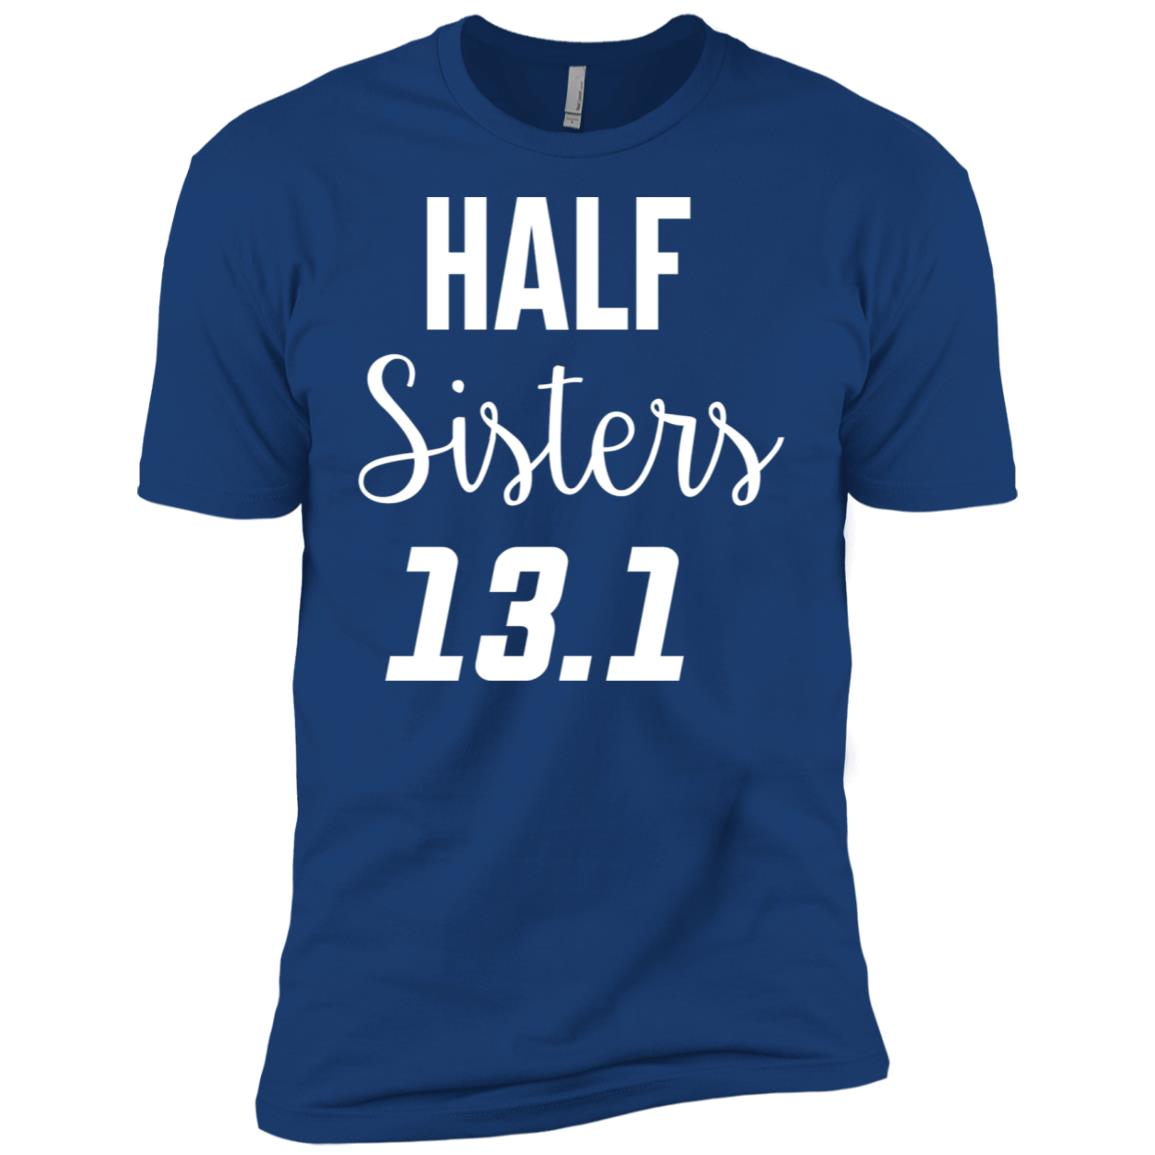 Half Sisters 13.1 Runners Men Short Sleeve T-Shirt